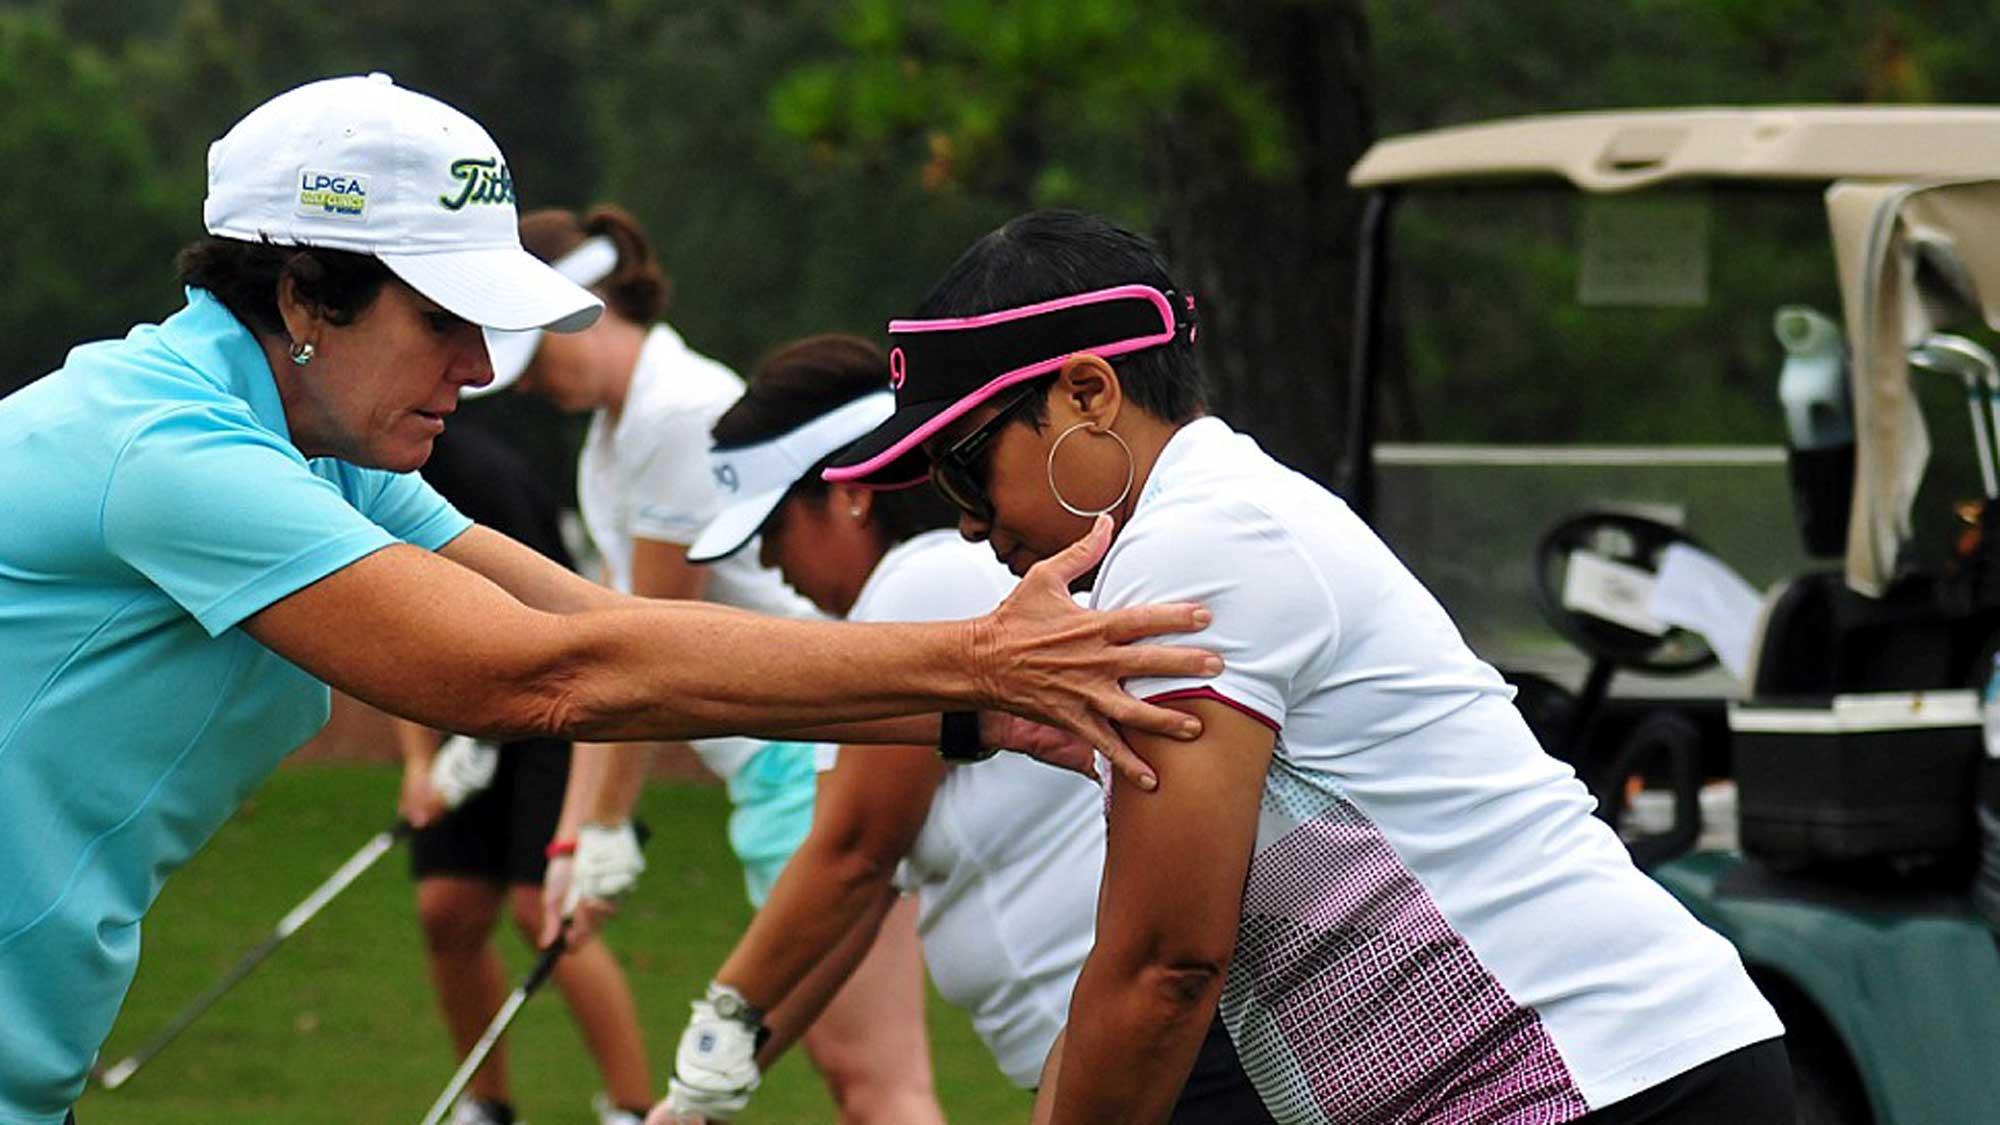 Patty Sheehan 6 LPGA majors